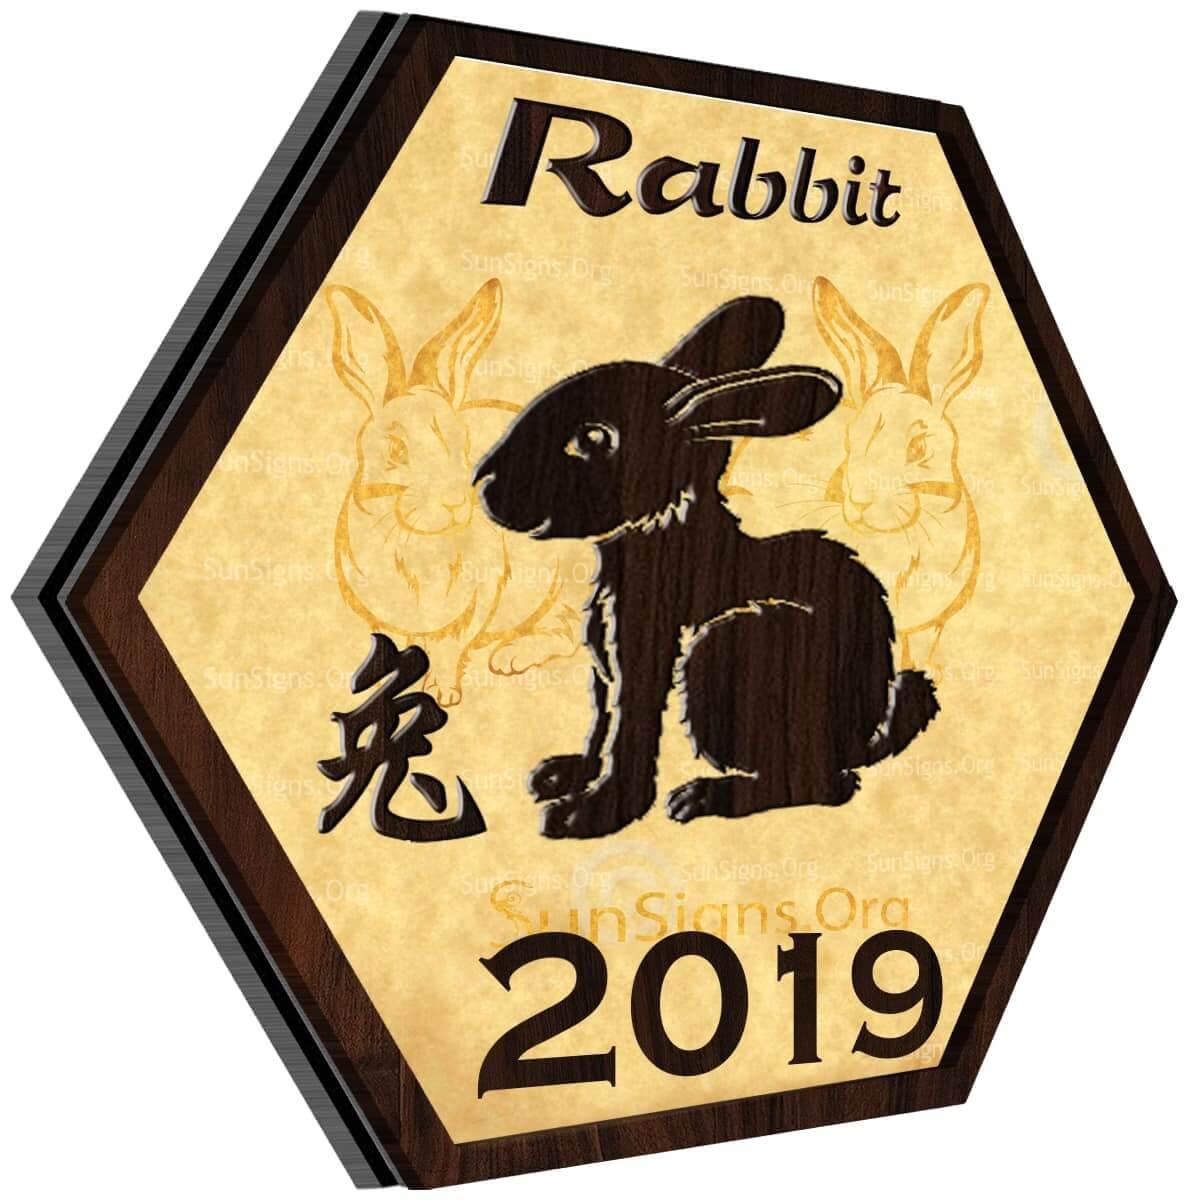 Rabbit Horoscope 2019 Predictions For Love, Finance, Career, Health And Family